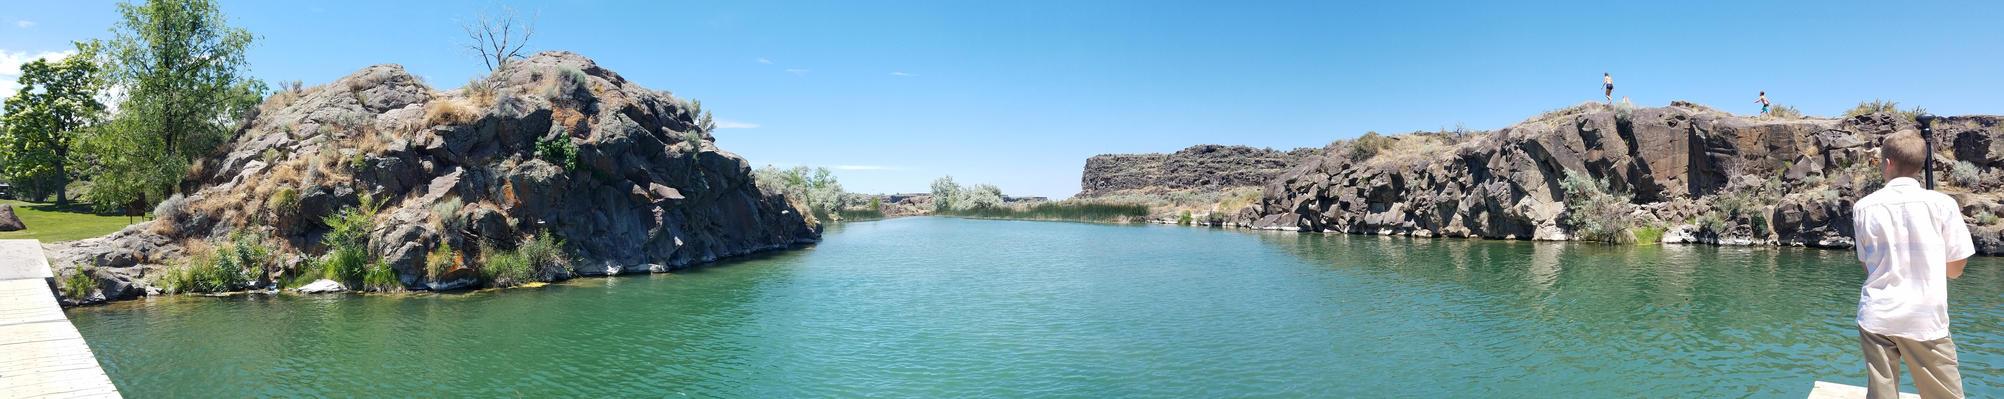 Shoshone River by BansheeTK